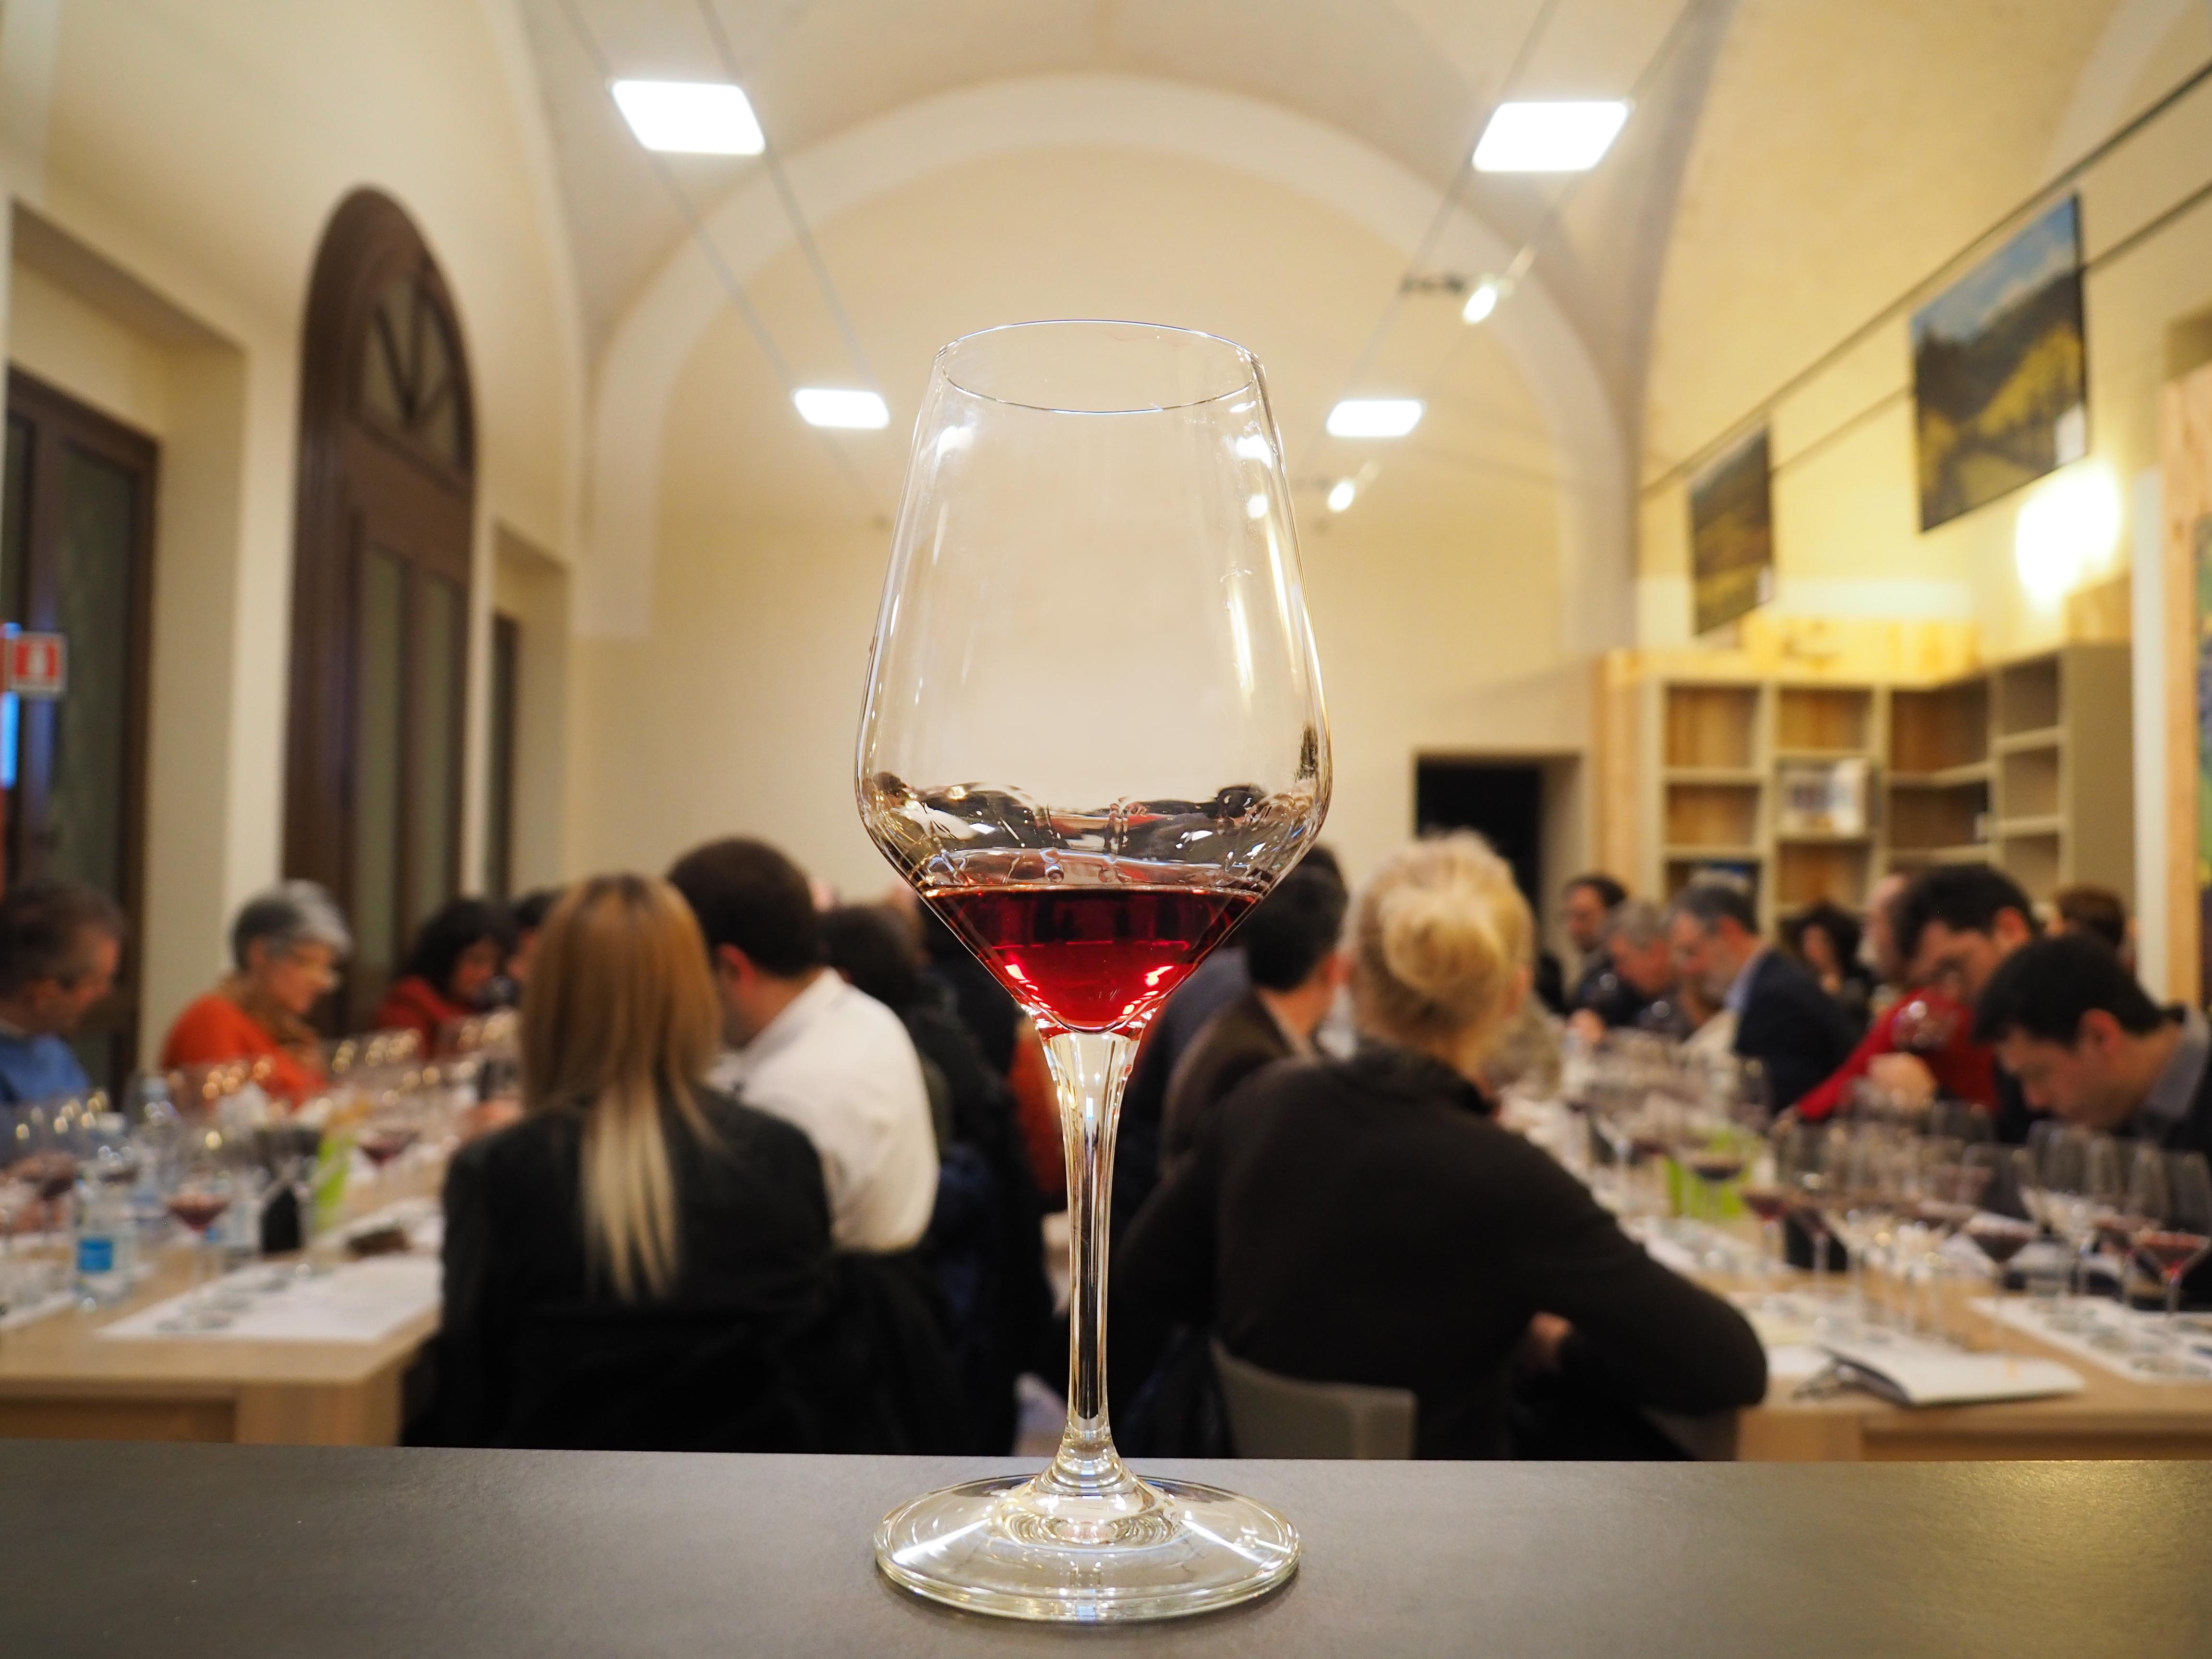 Una casa per i vini Rock: apre a Lonigo l'enoteca dei colli Berici